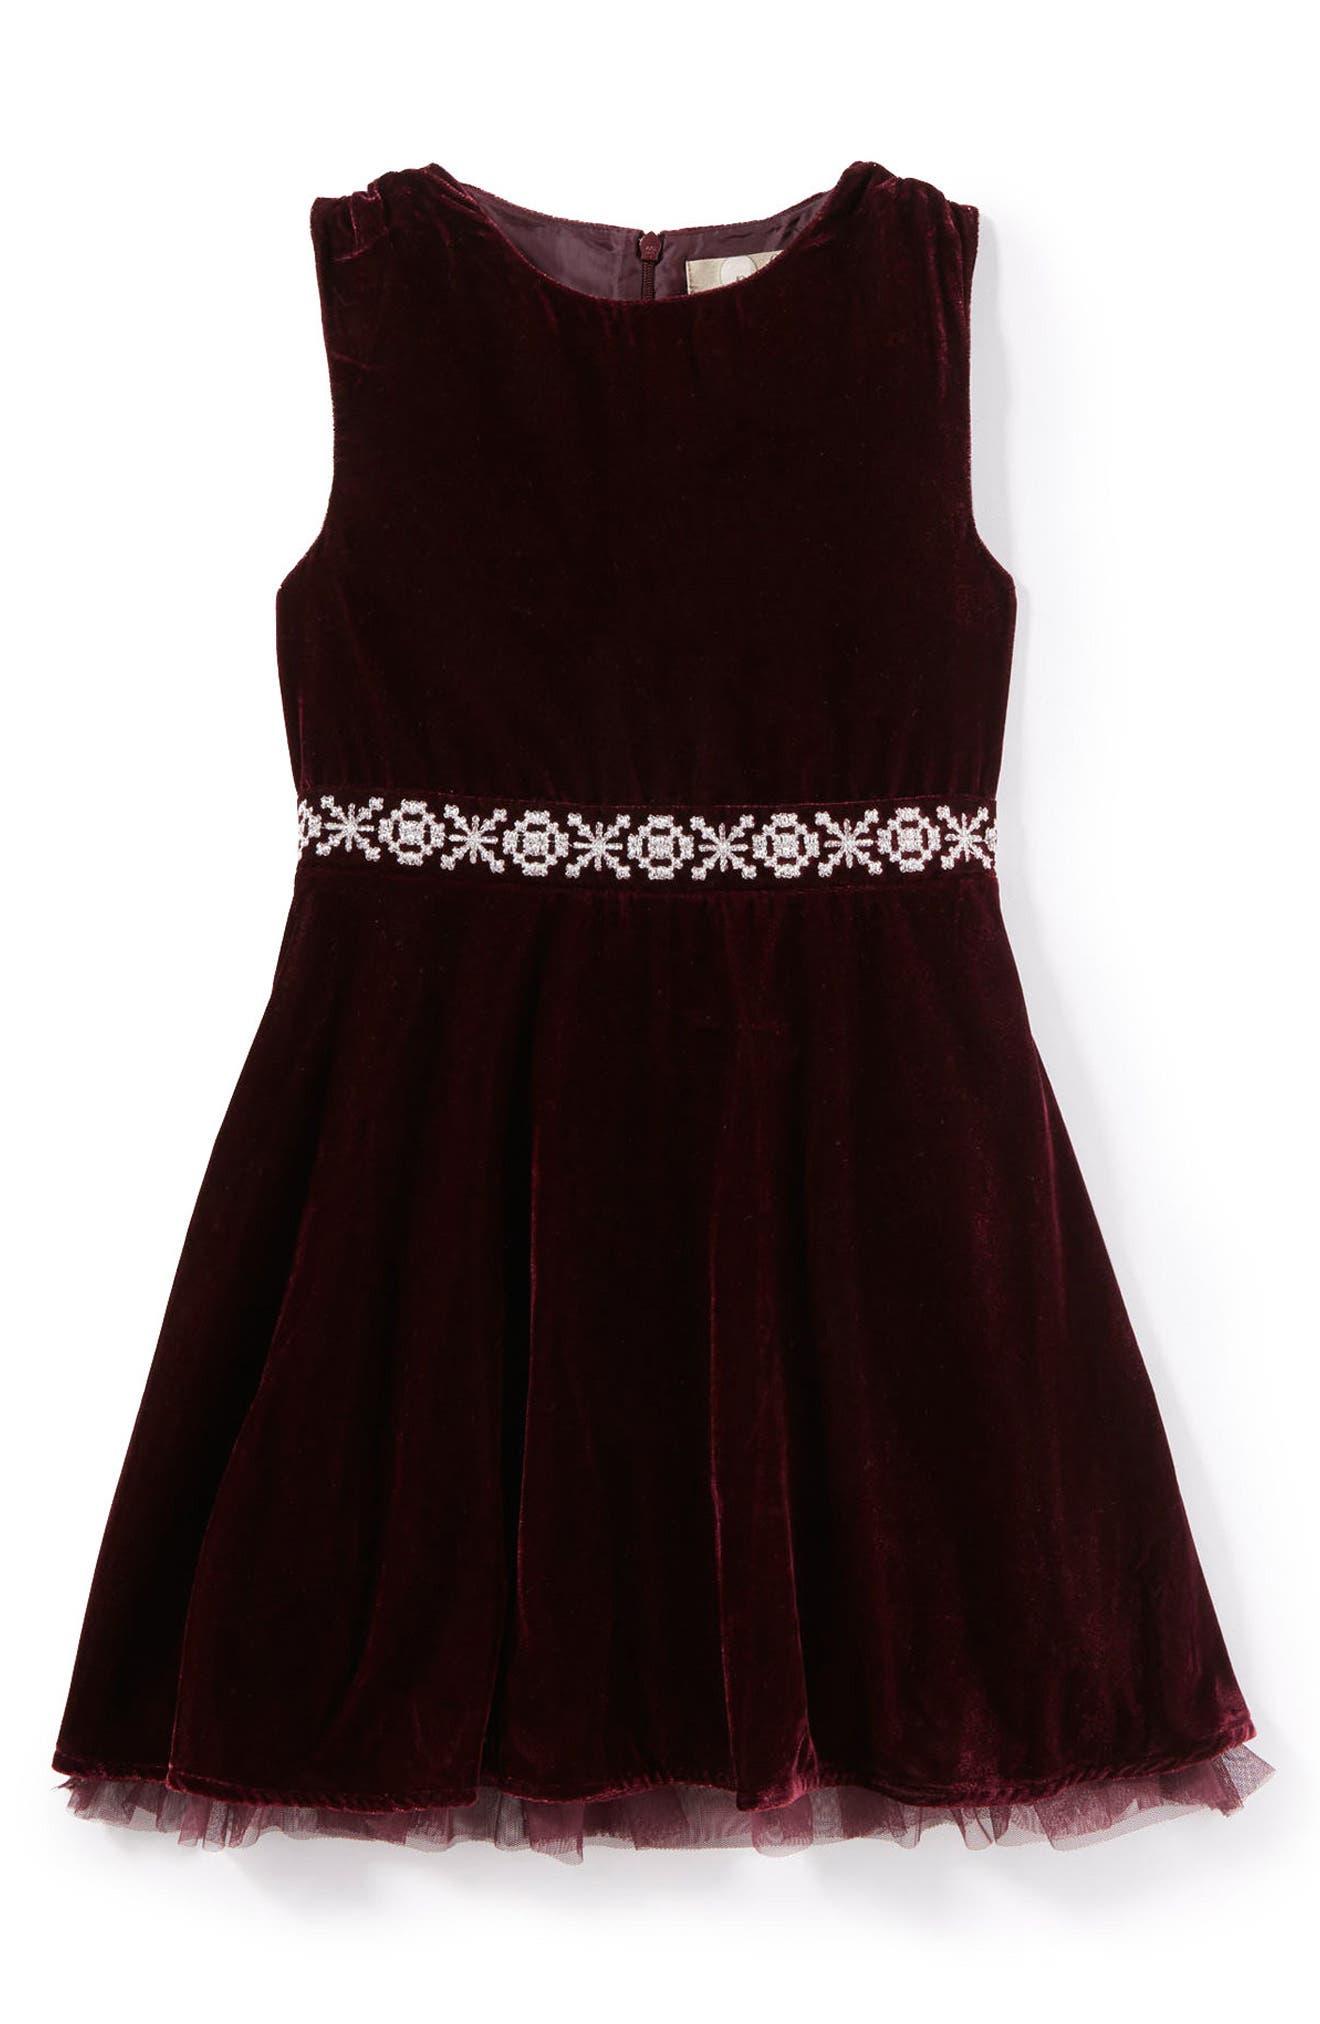 Vera Embroidered Snowflake Velvet Dress,                         Main,                         color, Burgundy